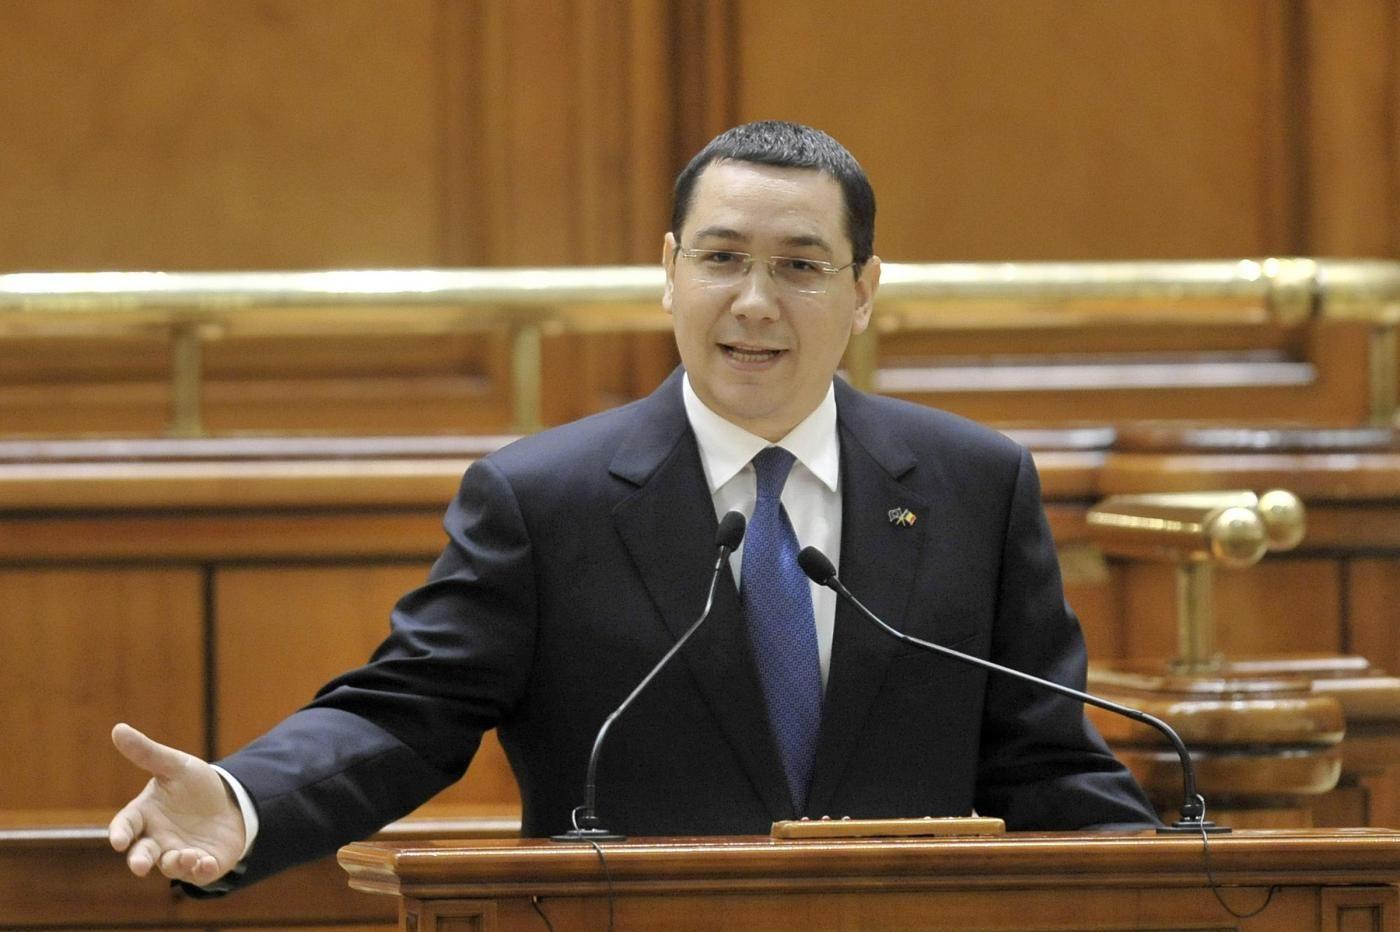 Romania, Dimissioni Premier Ponta